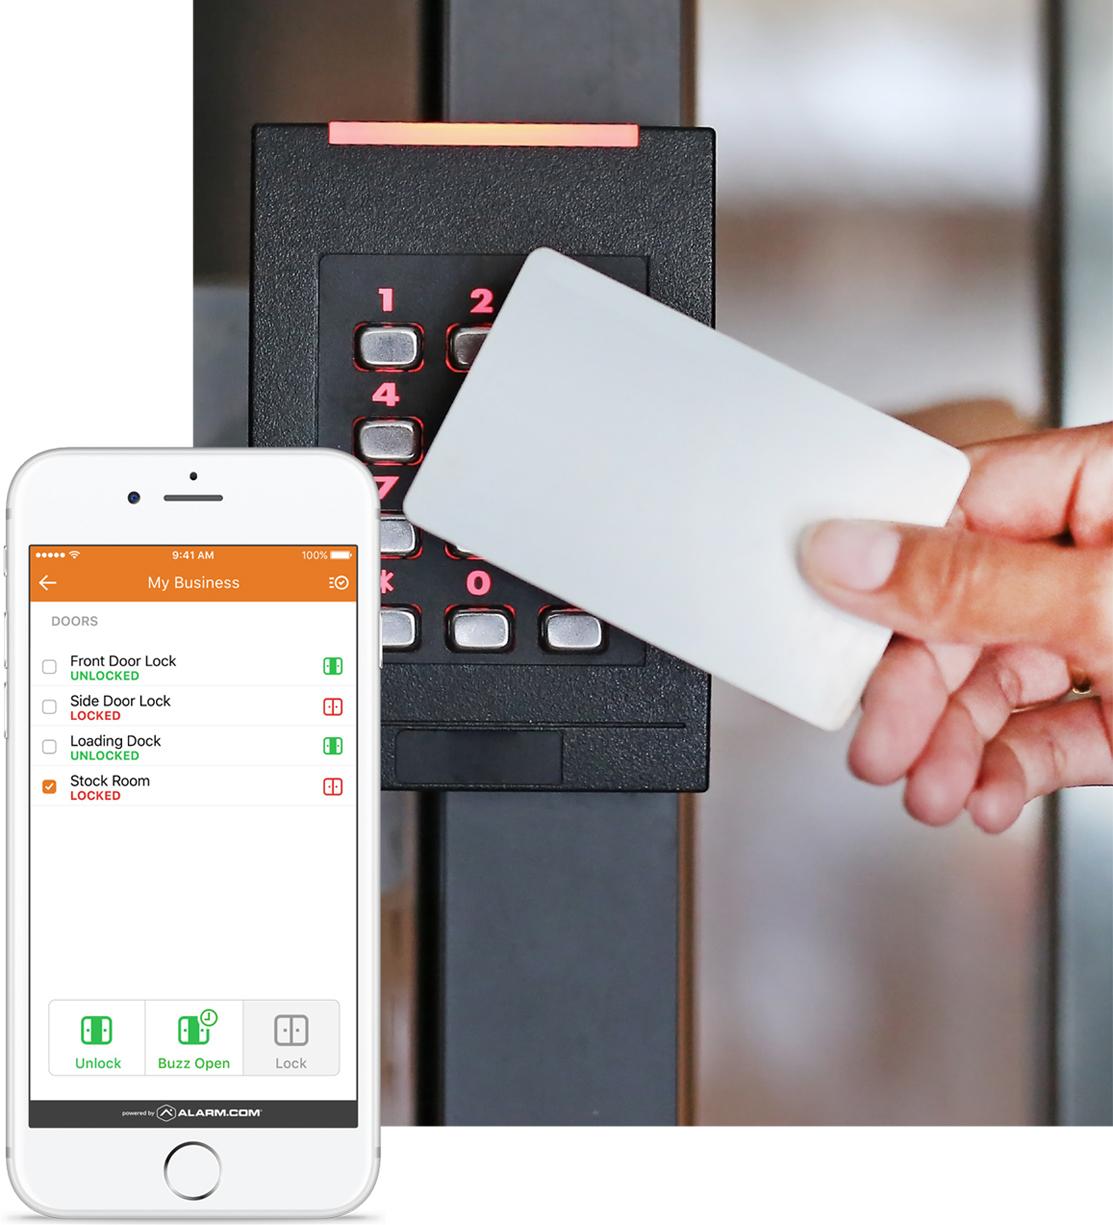 Alarm.com Key Card and Key Pad